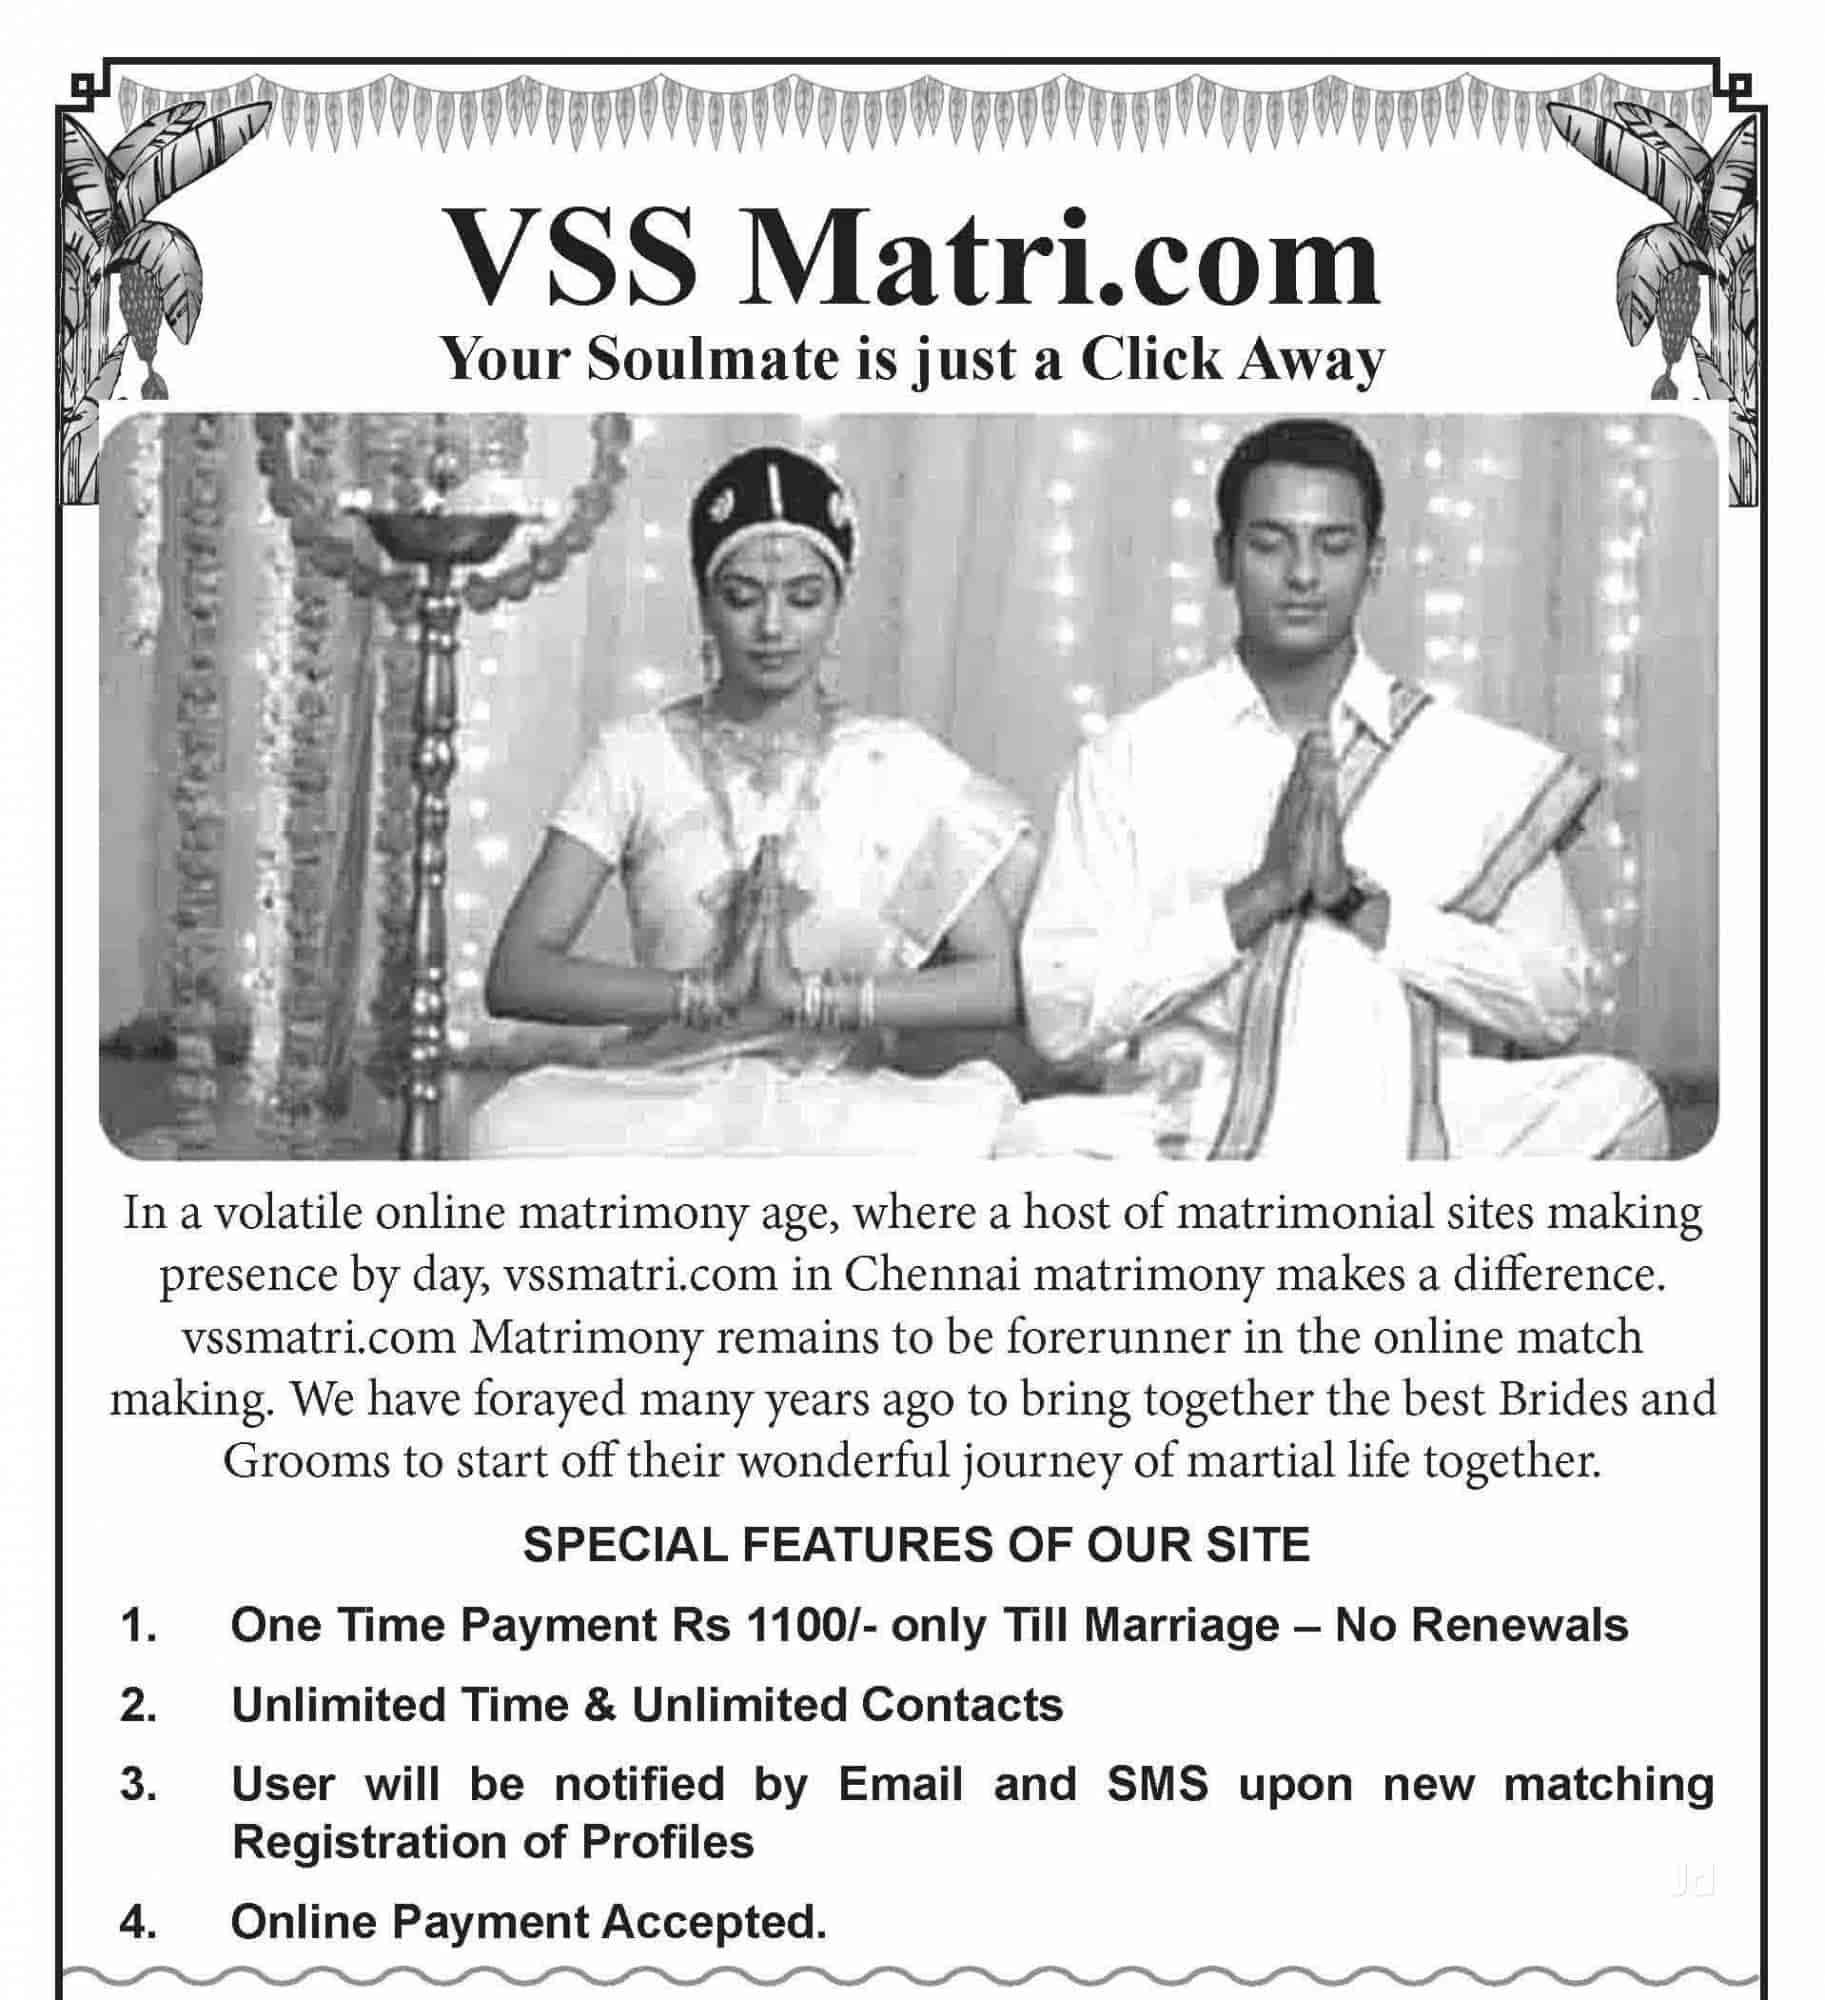 VSS Matrimonial Services, Alapakkam - Matrimonial Bureaus in